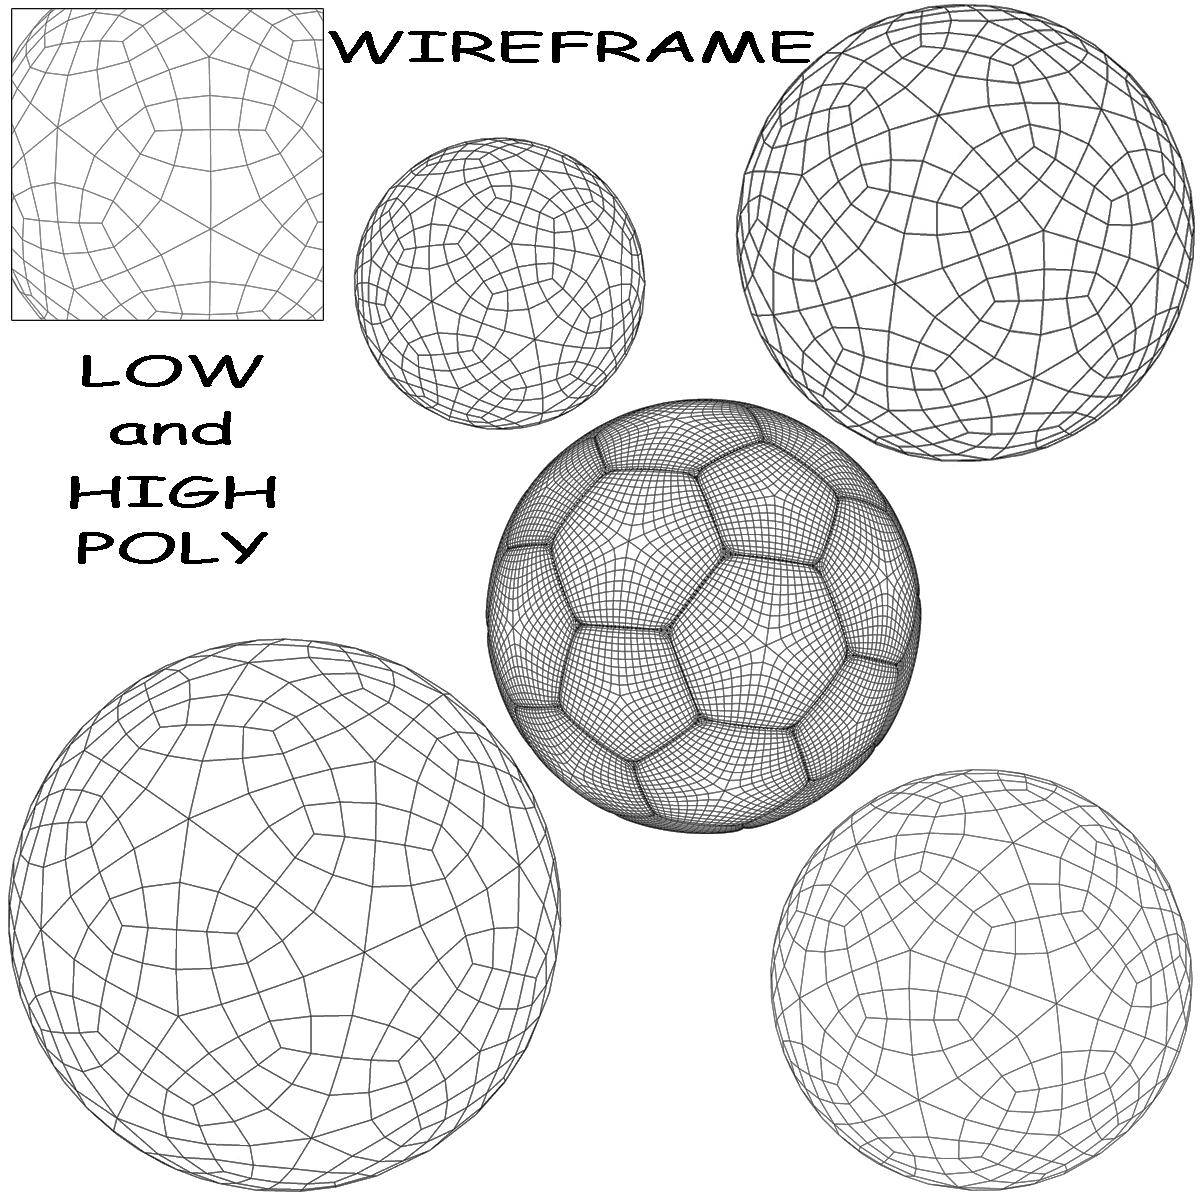 soccerball цэнхэр хар 3d загвар 3ds max fbx c4d ma mb obj 204379